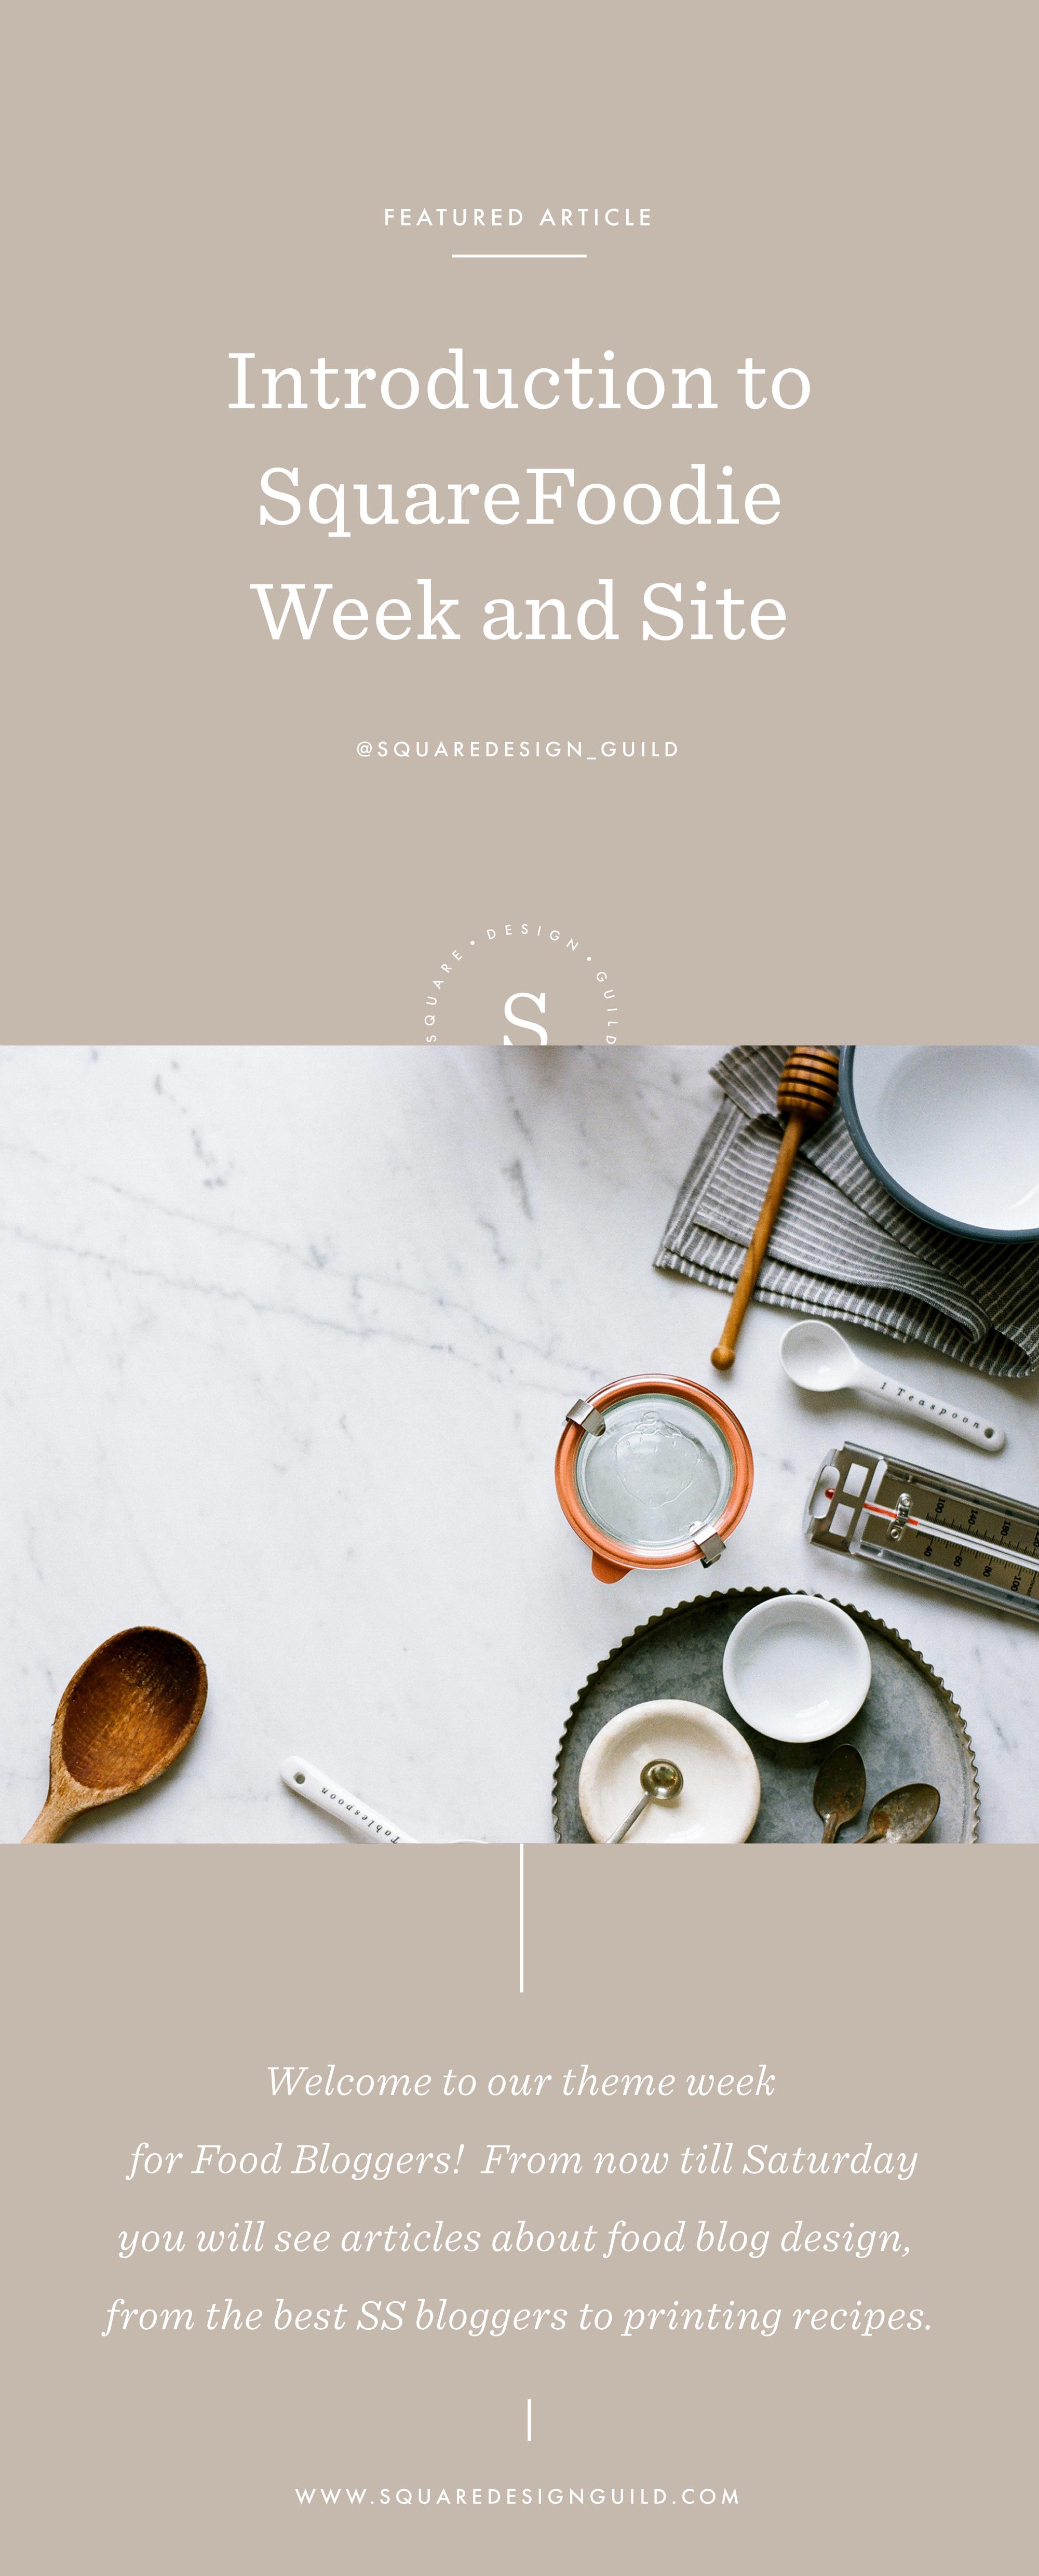 Food Blogging on Squarespace